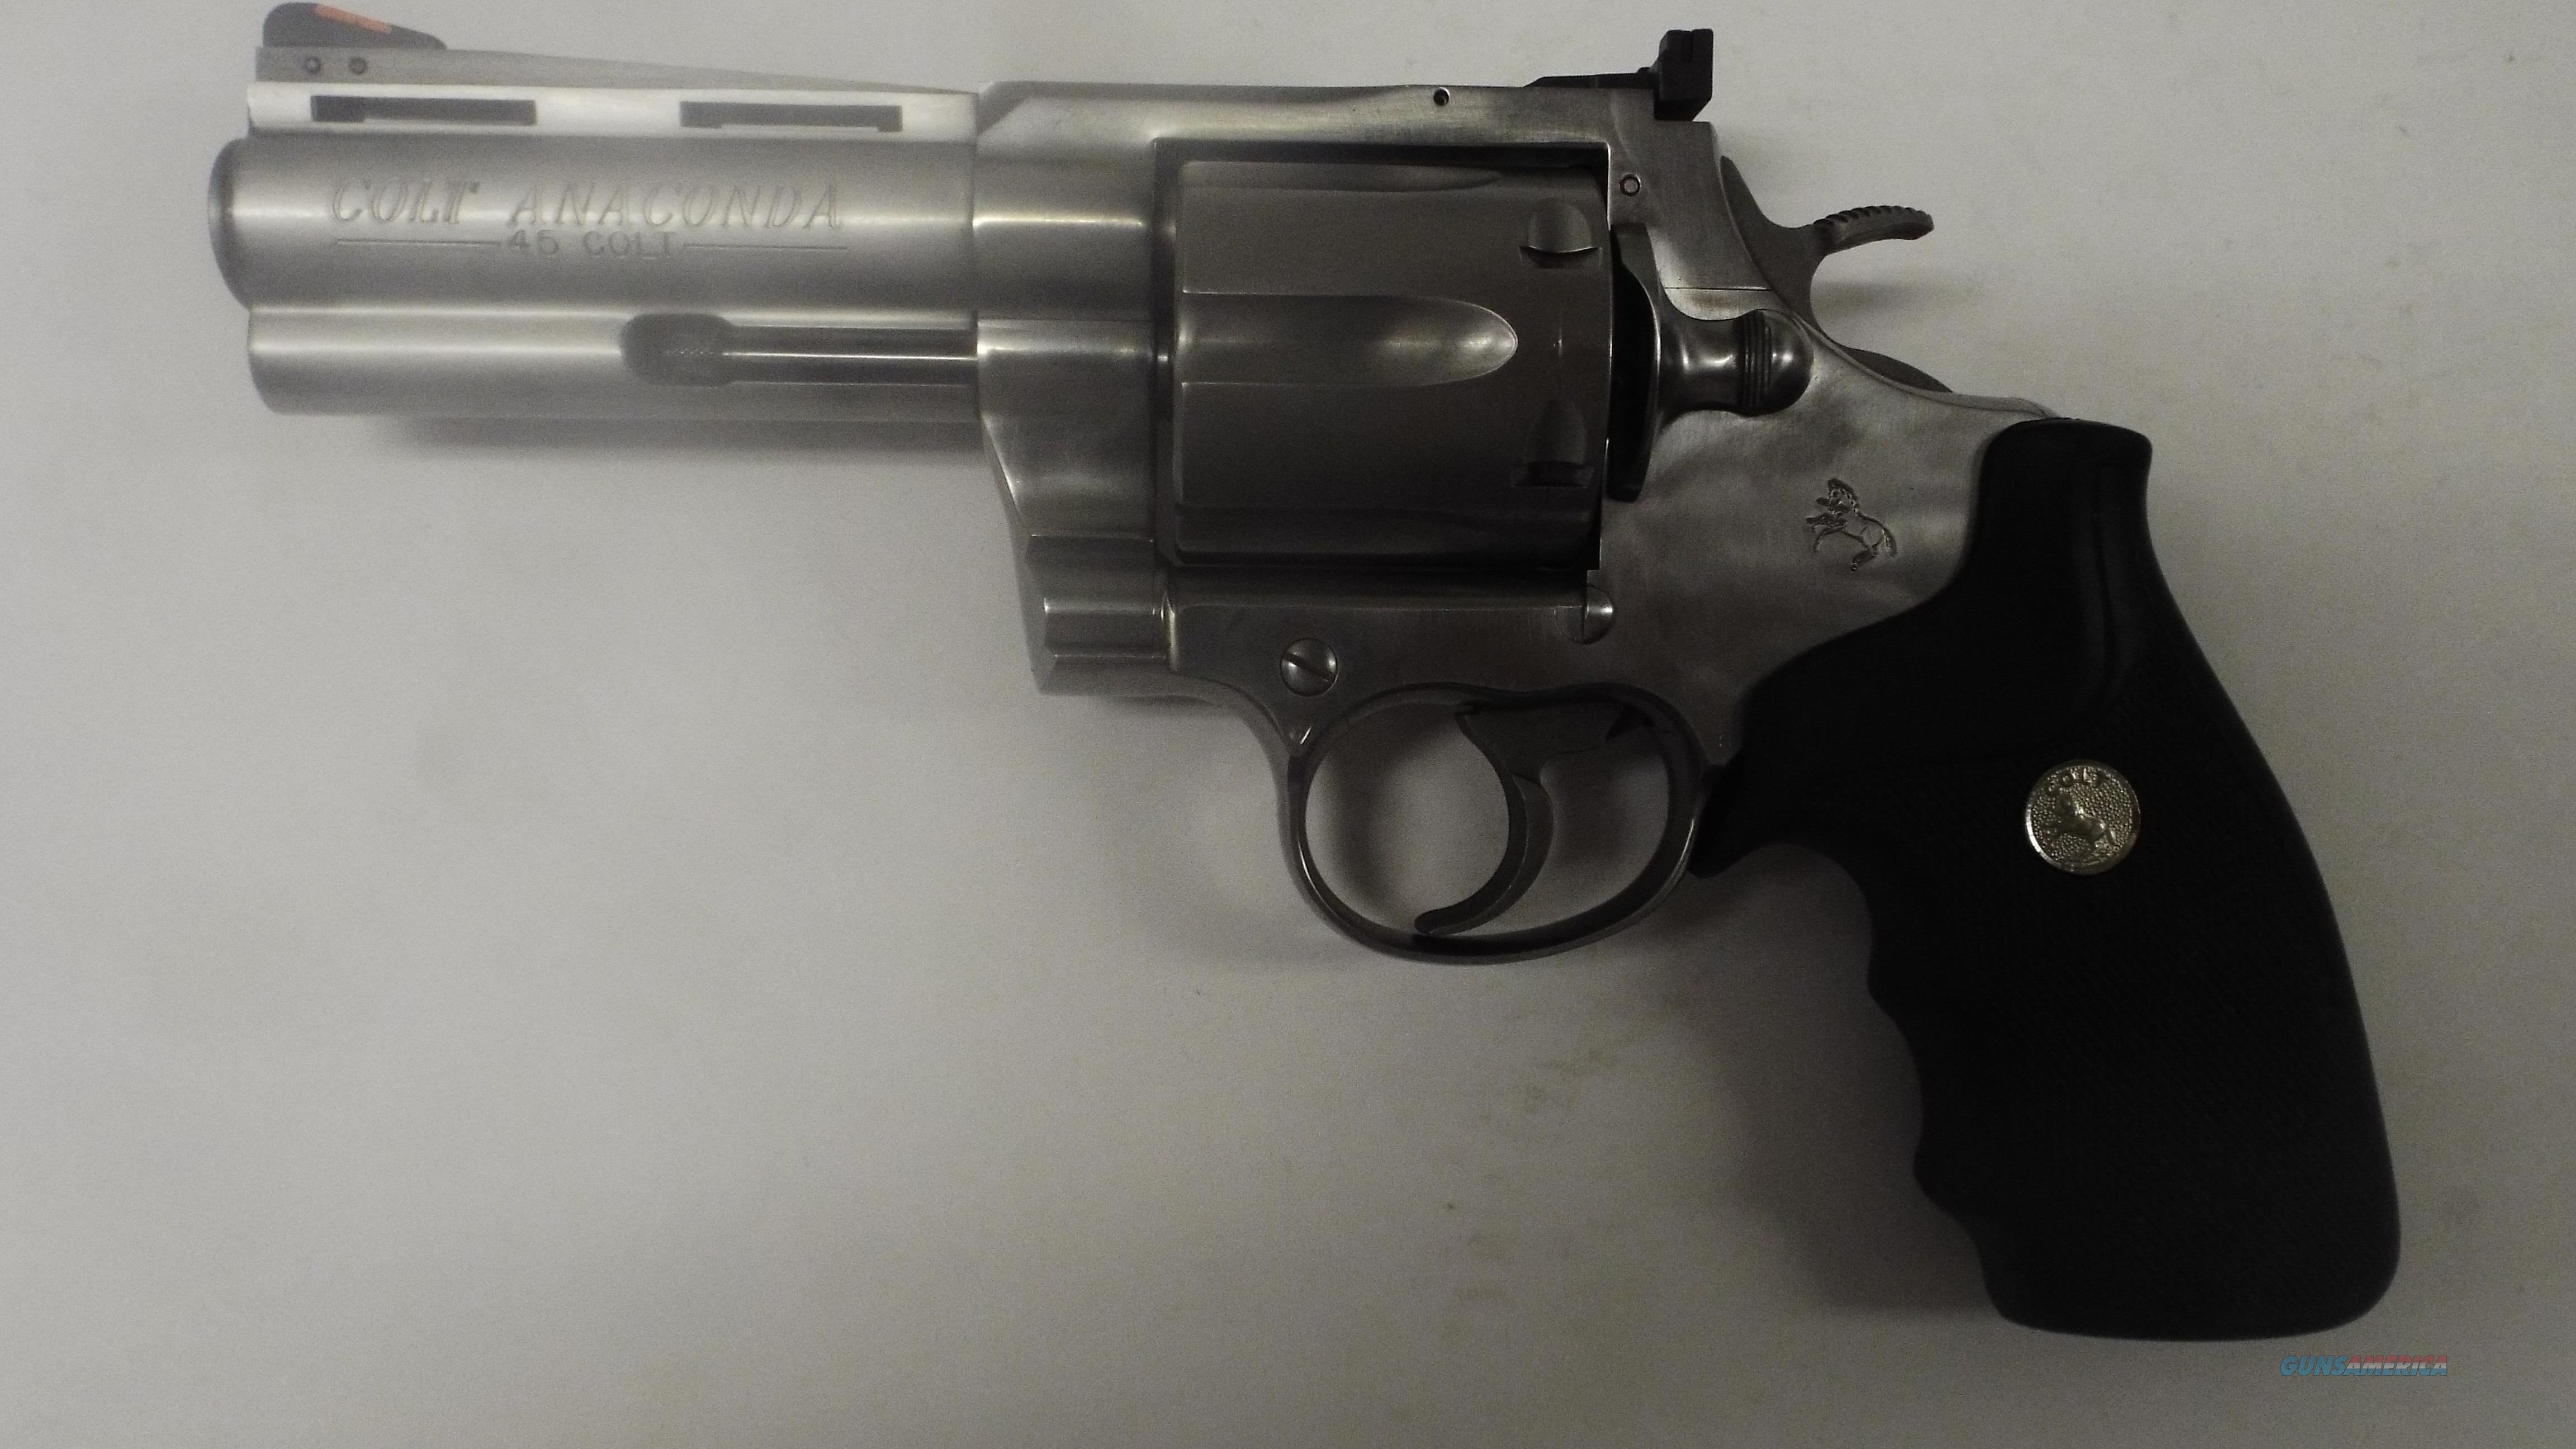 UNICORN GUN COLT ANACONDA 45 LONG COLT 4 INCH STAINLESS